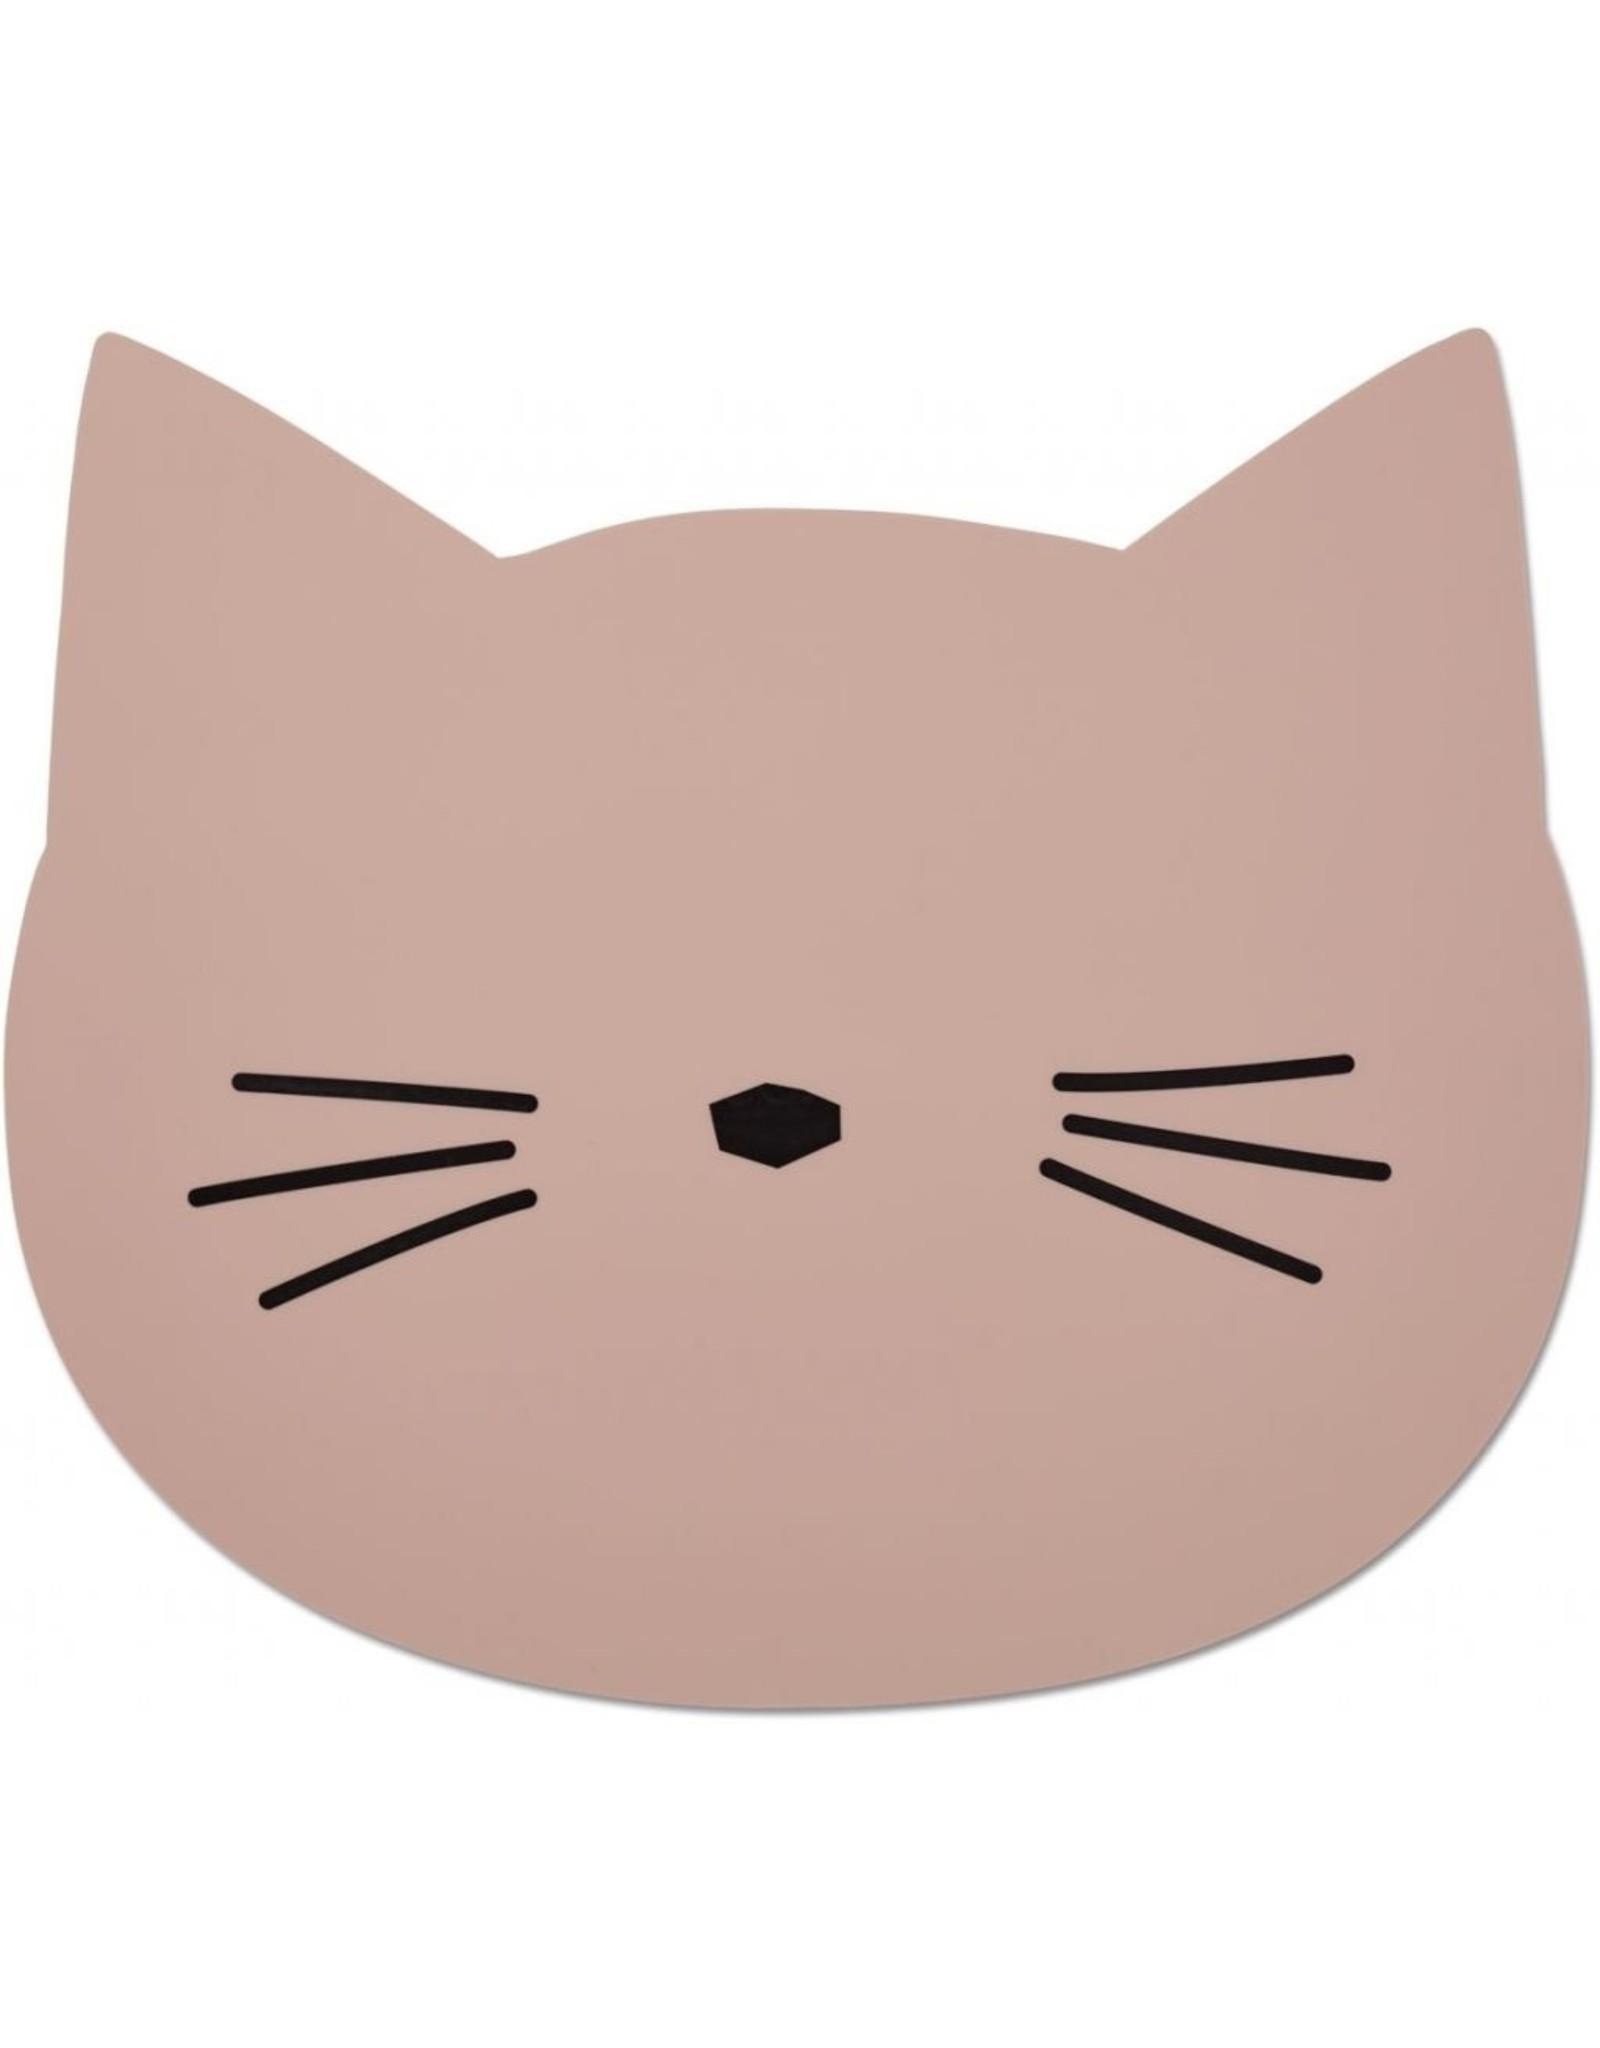 Liewood Aura Placemat - Cat Rose